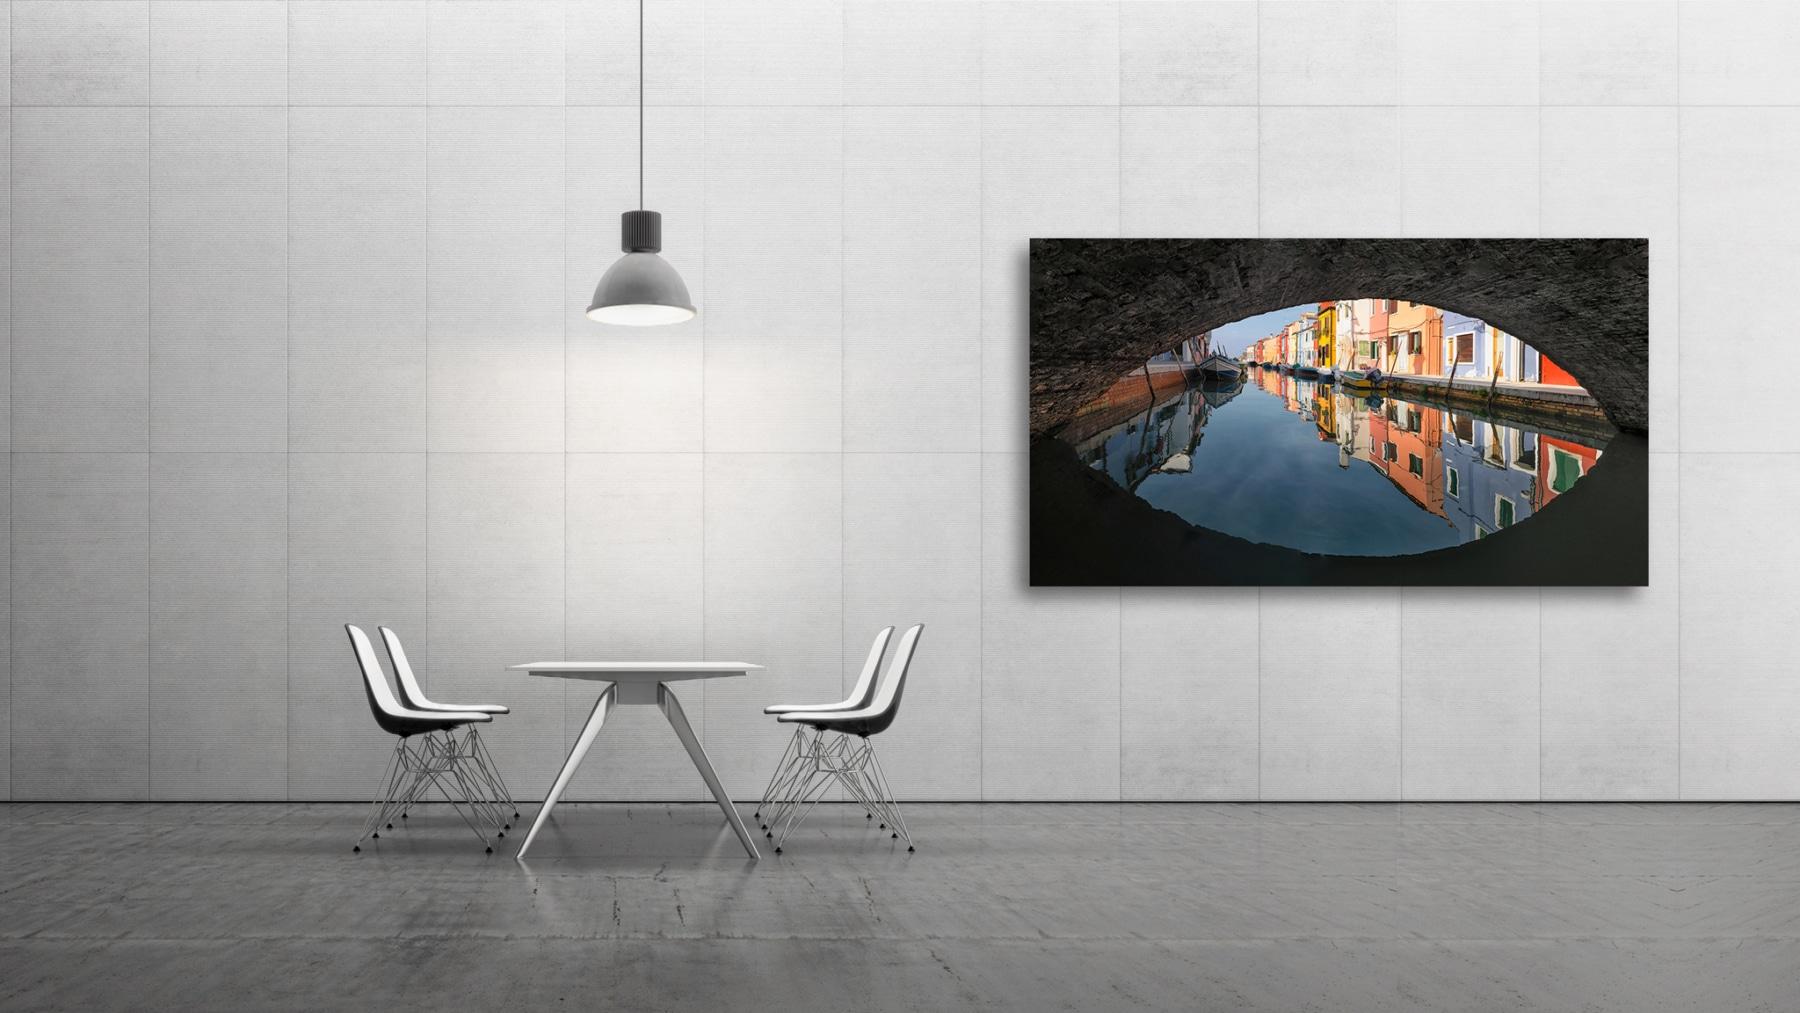 under the bridge - Italy, Venice, Burano © by Gerry Pacher